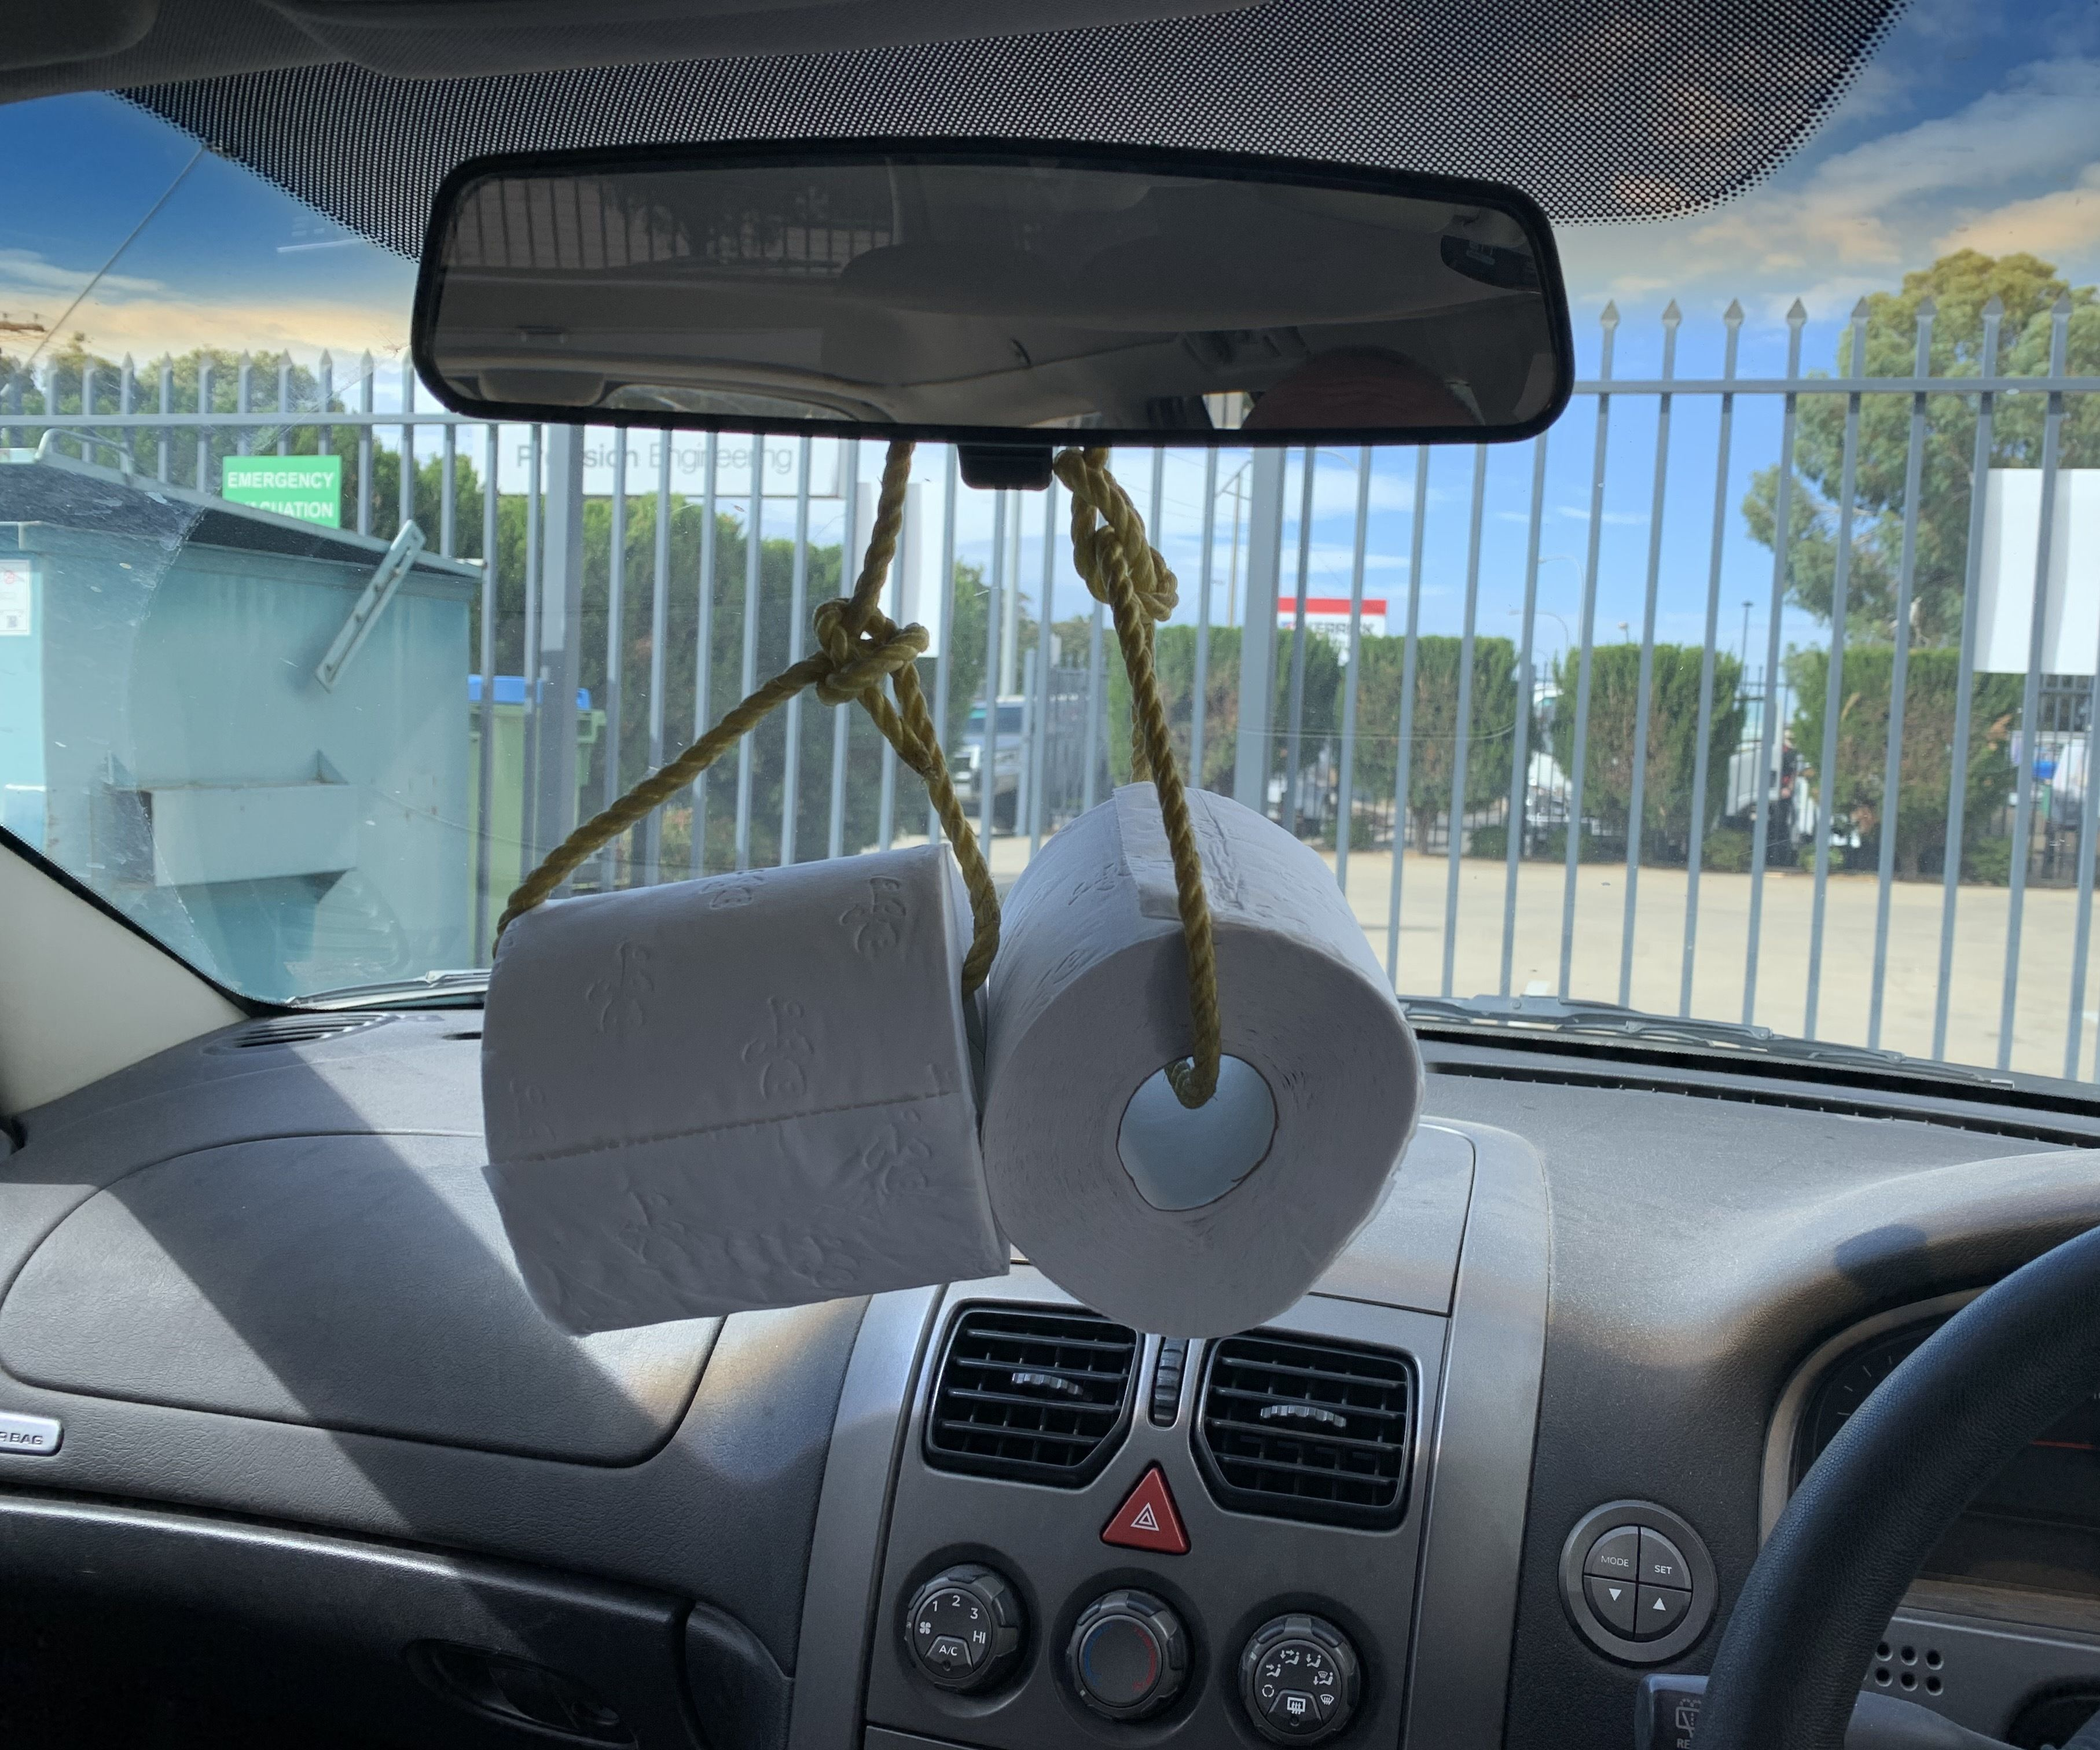 Toilet Paper Hanging Car Ornament